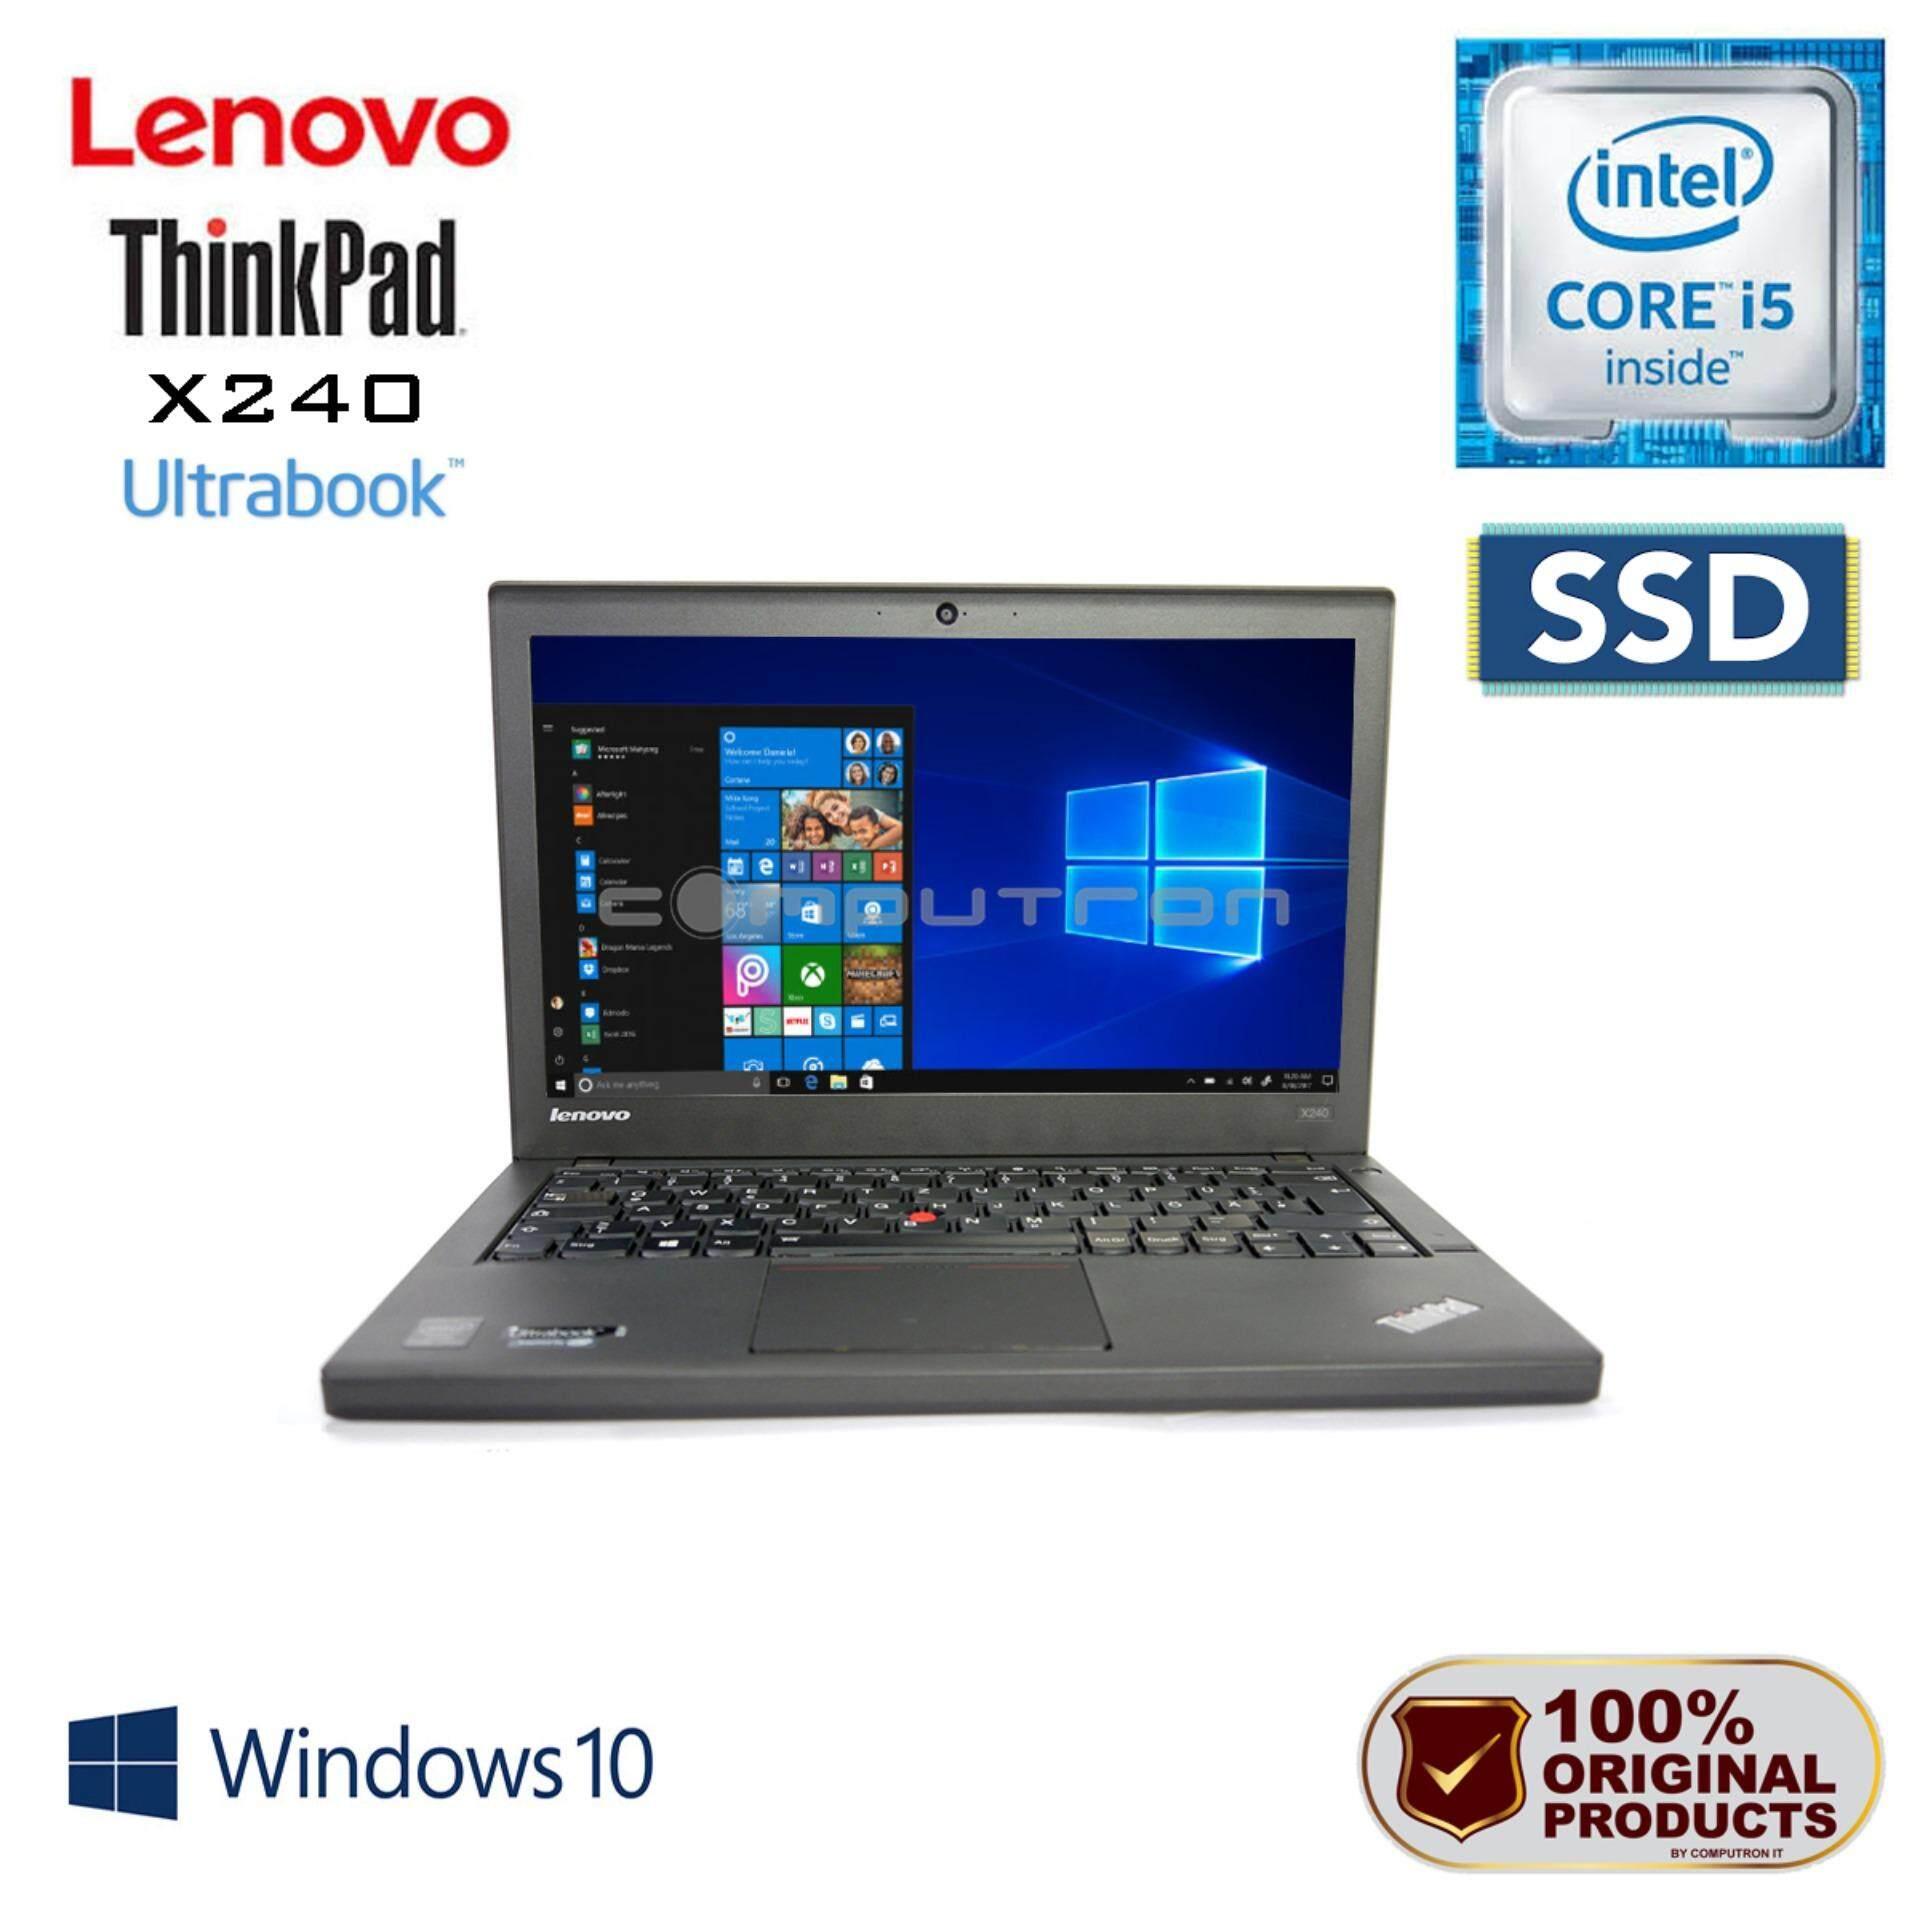 LENOVO THINKPAD X240 CORE I5 / 4GB RAM / 128GB SSD / W10PRO  [ 1 YEAR WARRANTY ] Malaysia